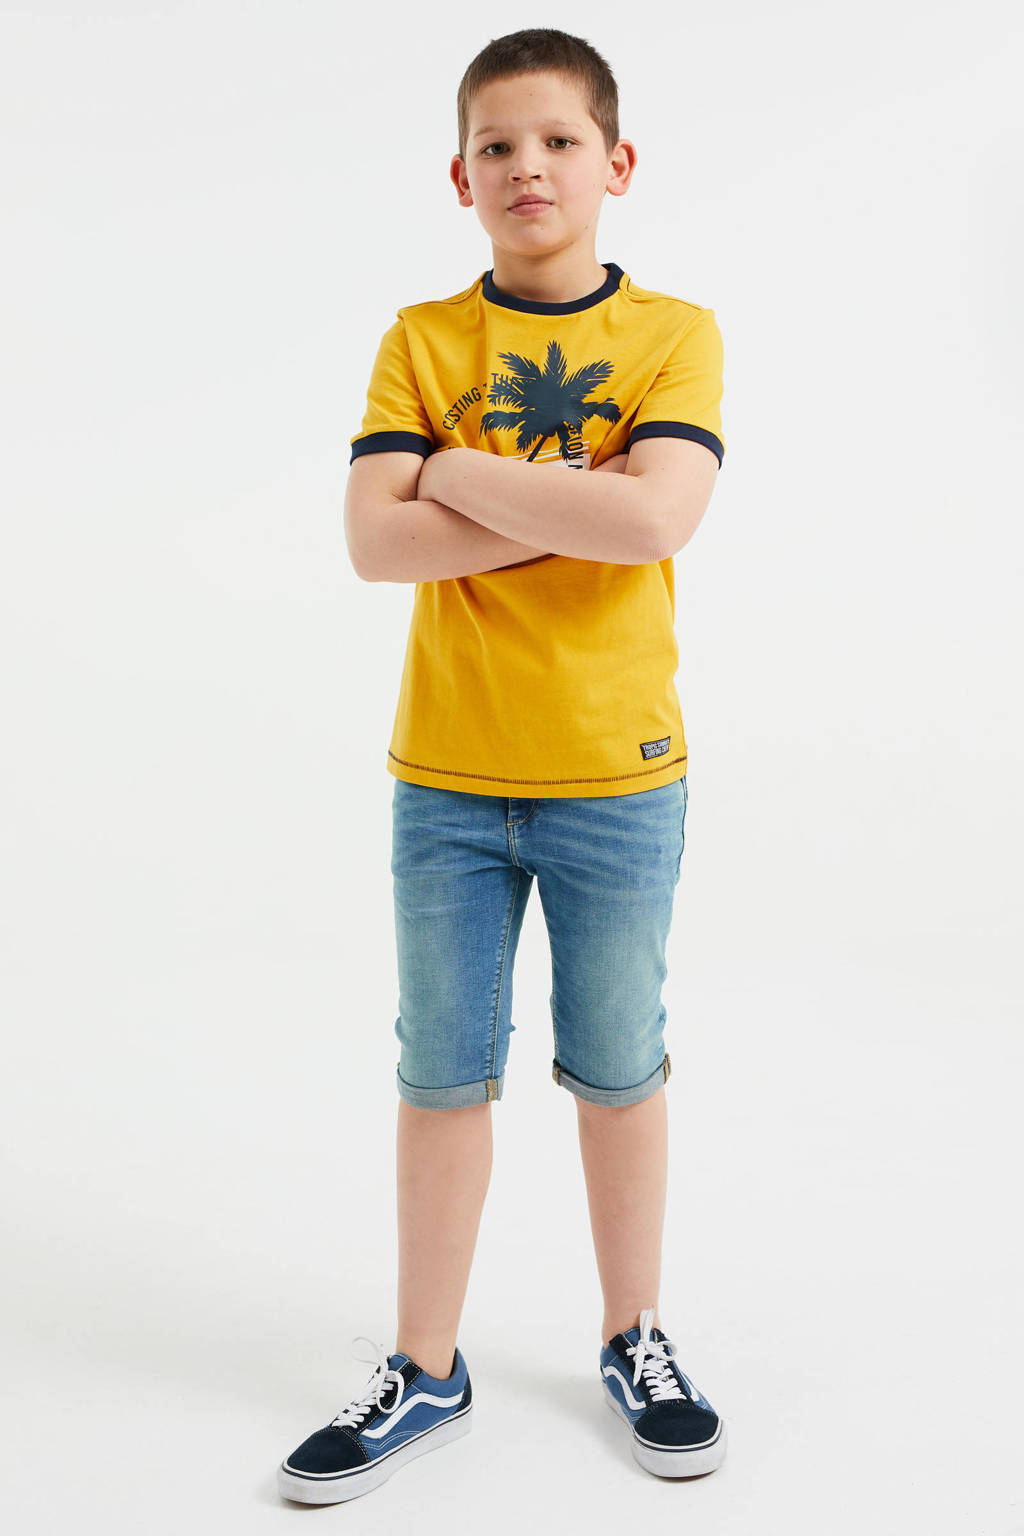 WE Fashion T-shirt - set van 2 donkerblauw/geel, Donkerblauw/geel